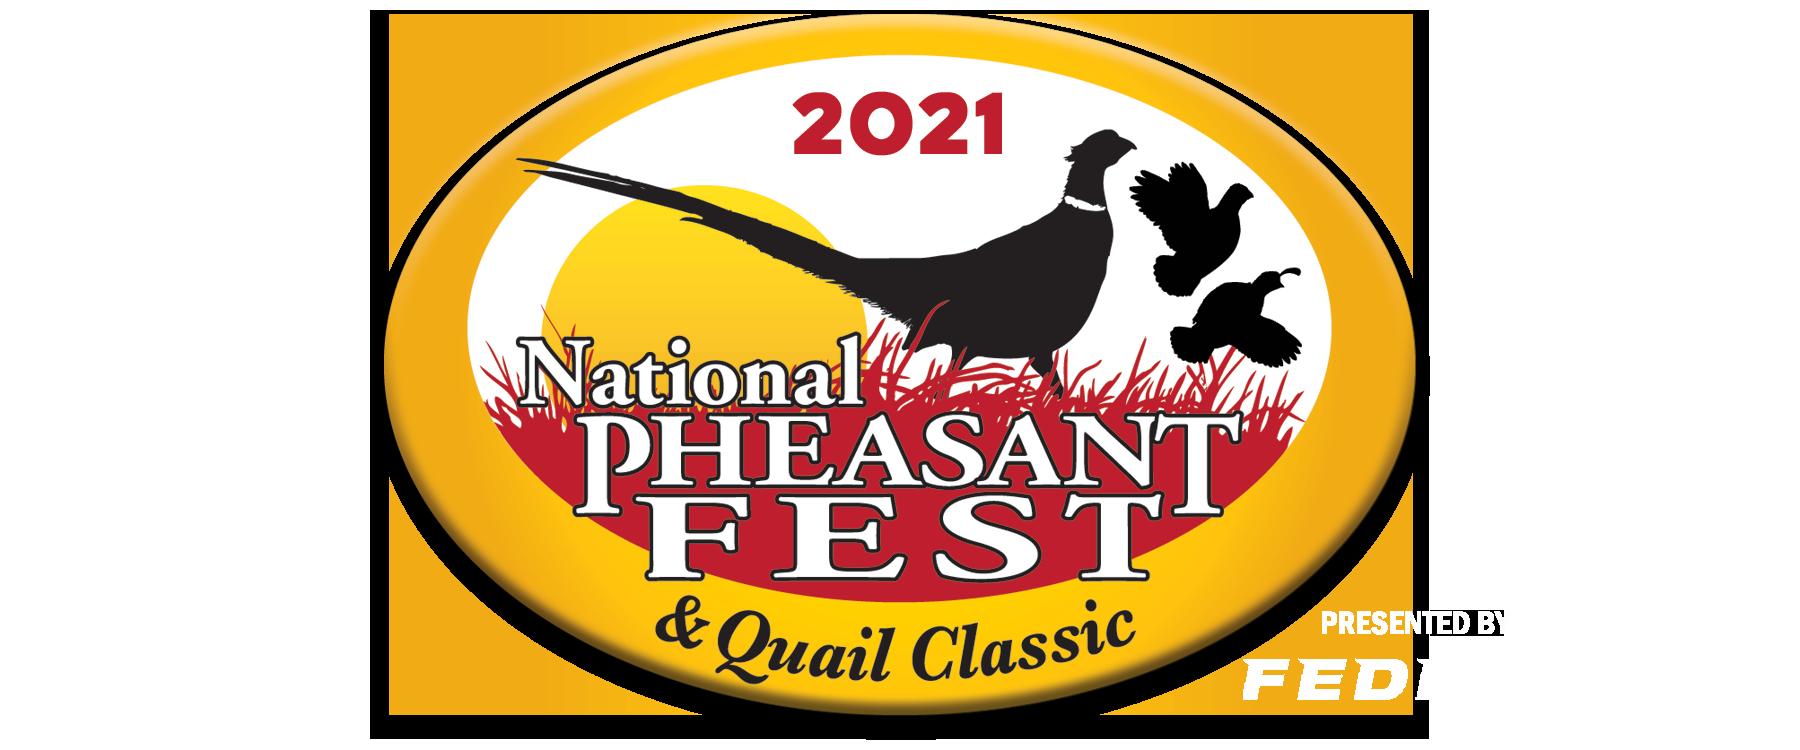 2021 National Pheasant Fest and Quail Classic